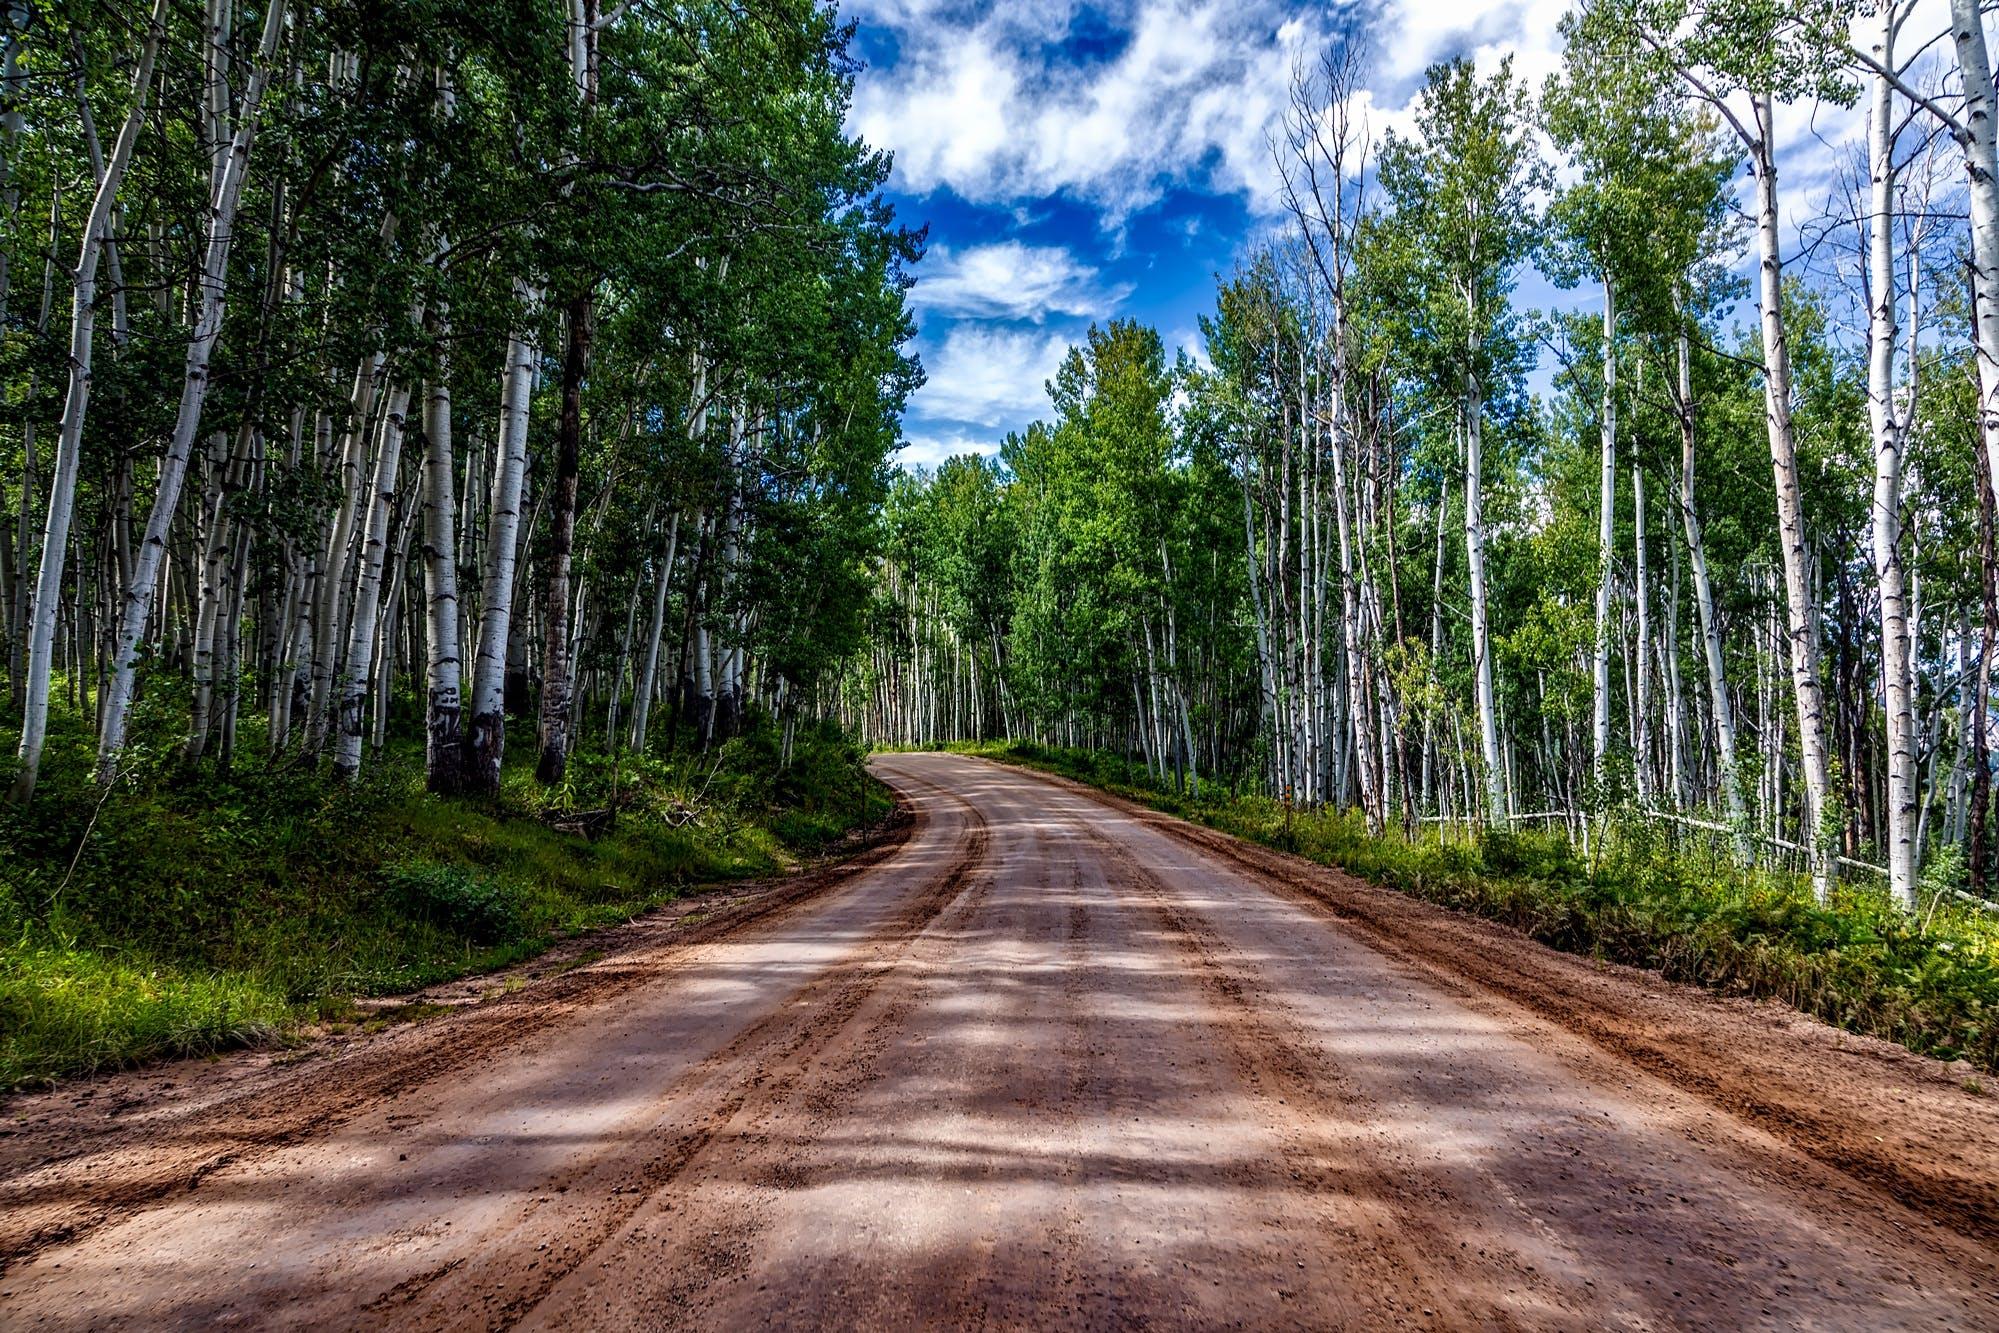 Kostenloses Stock Foto zu bäume, baumstamm, beratung, espen